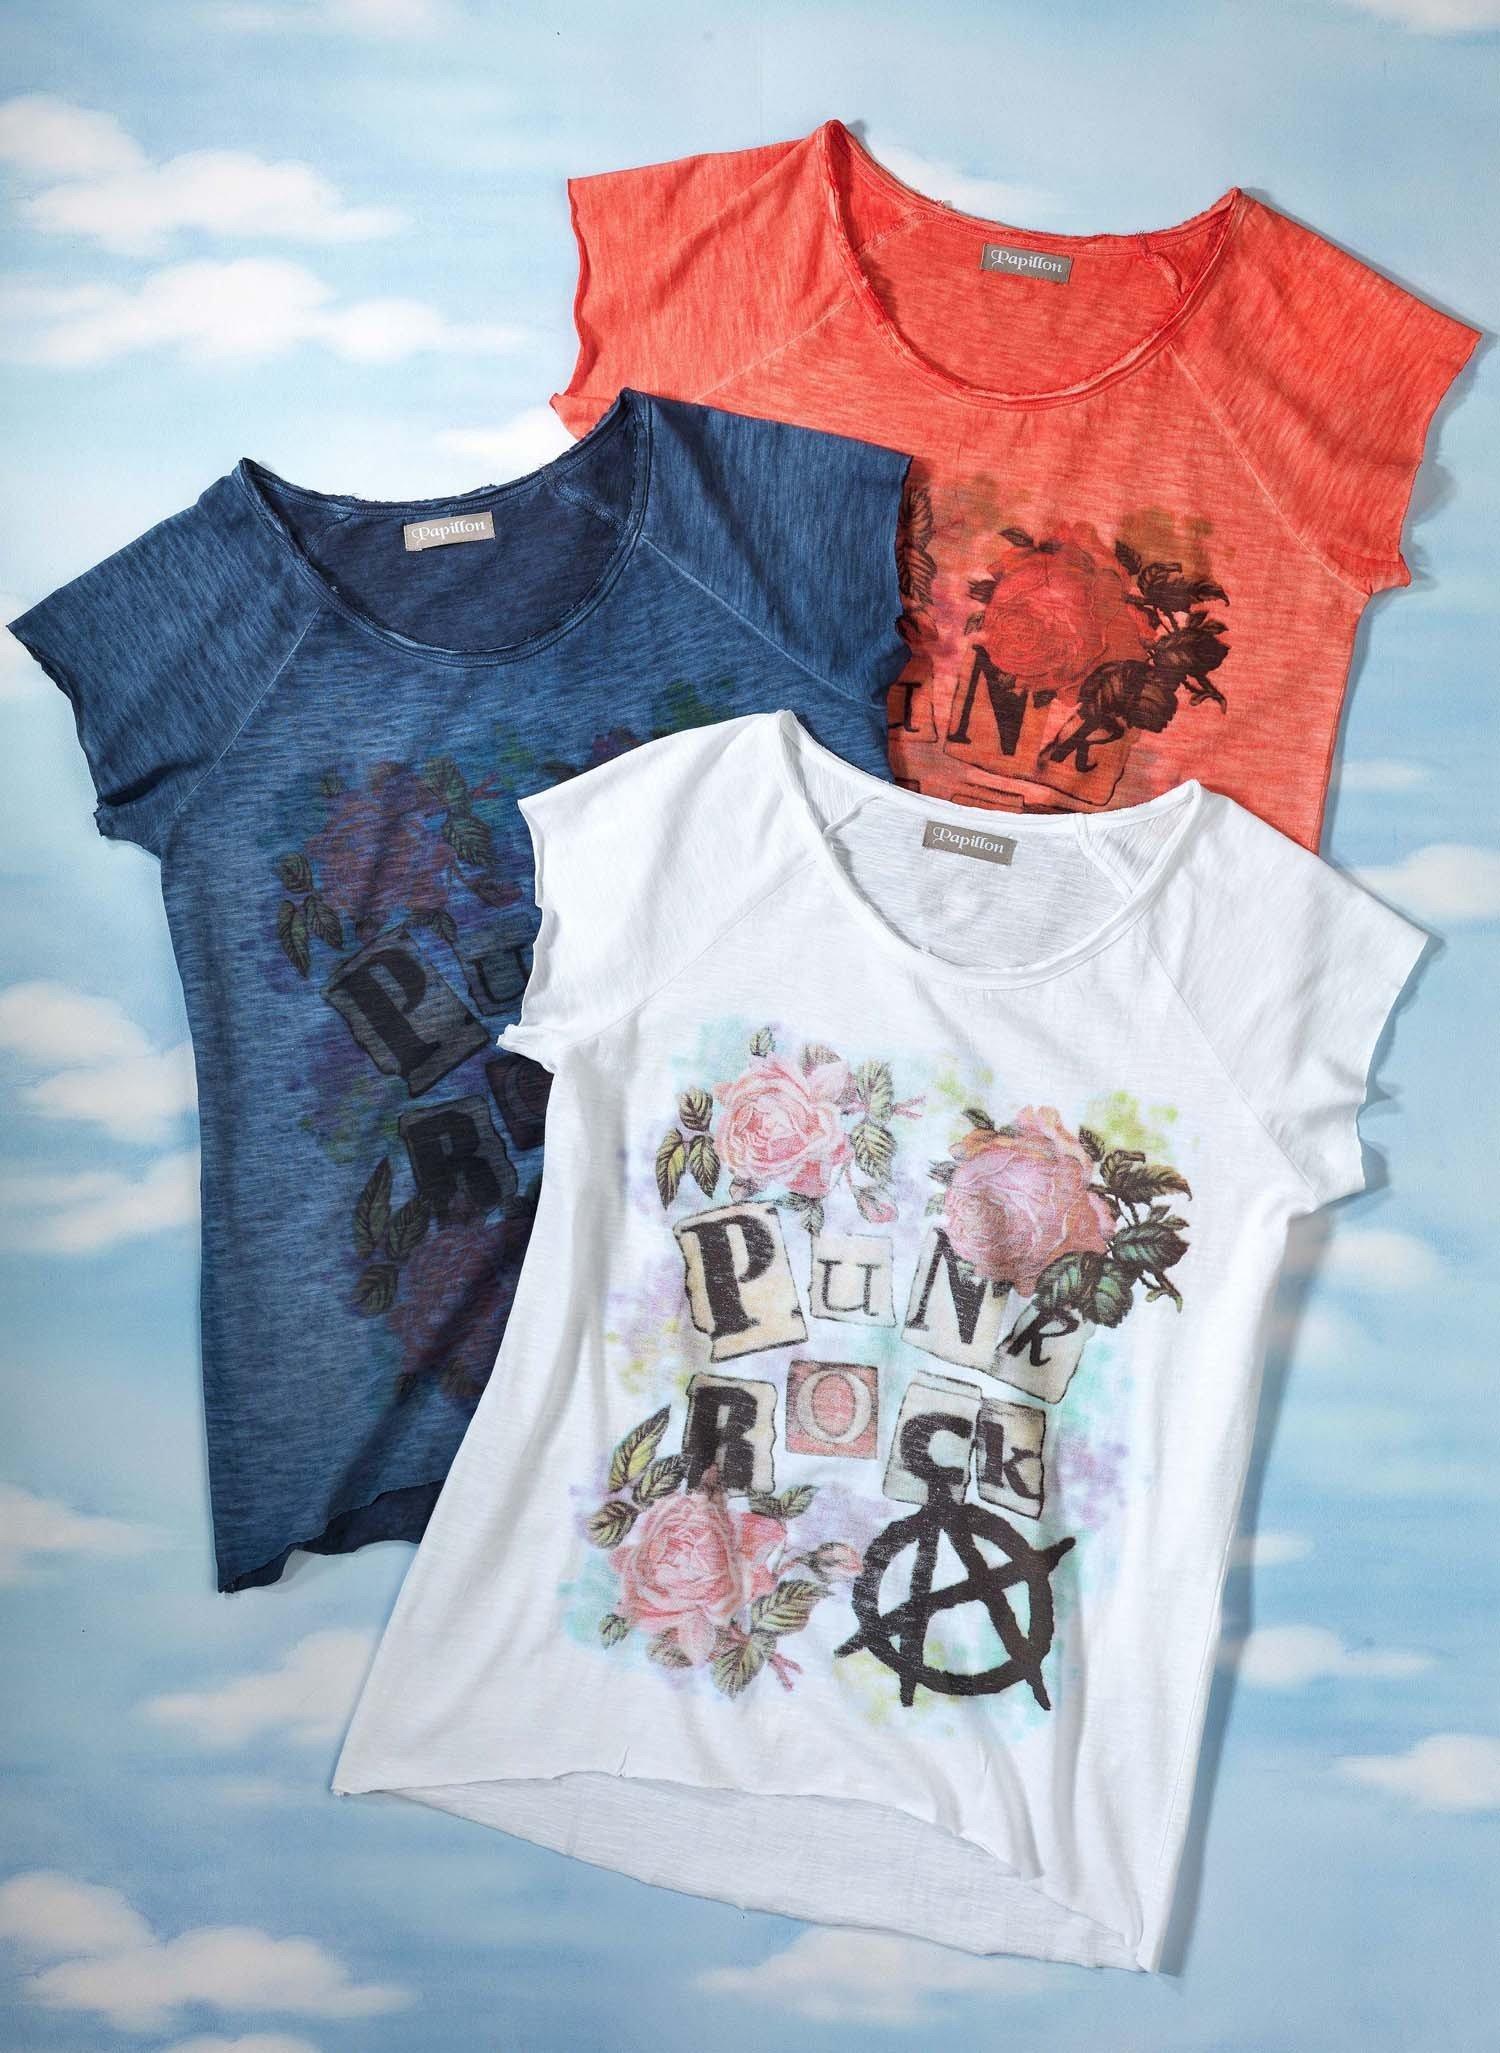 D-KA-Shirt,Laser-Cut coralle L 324 - 2 - Ronja.ch